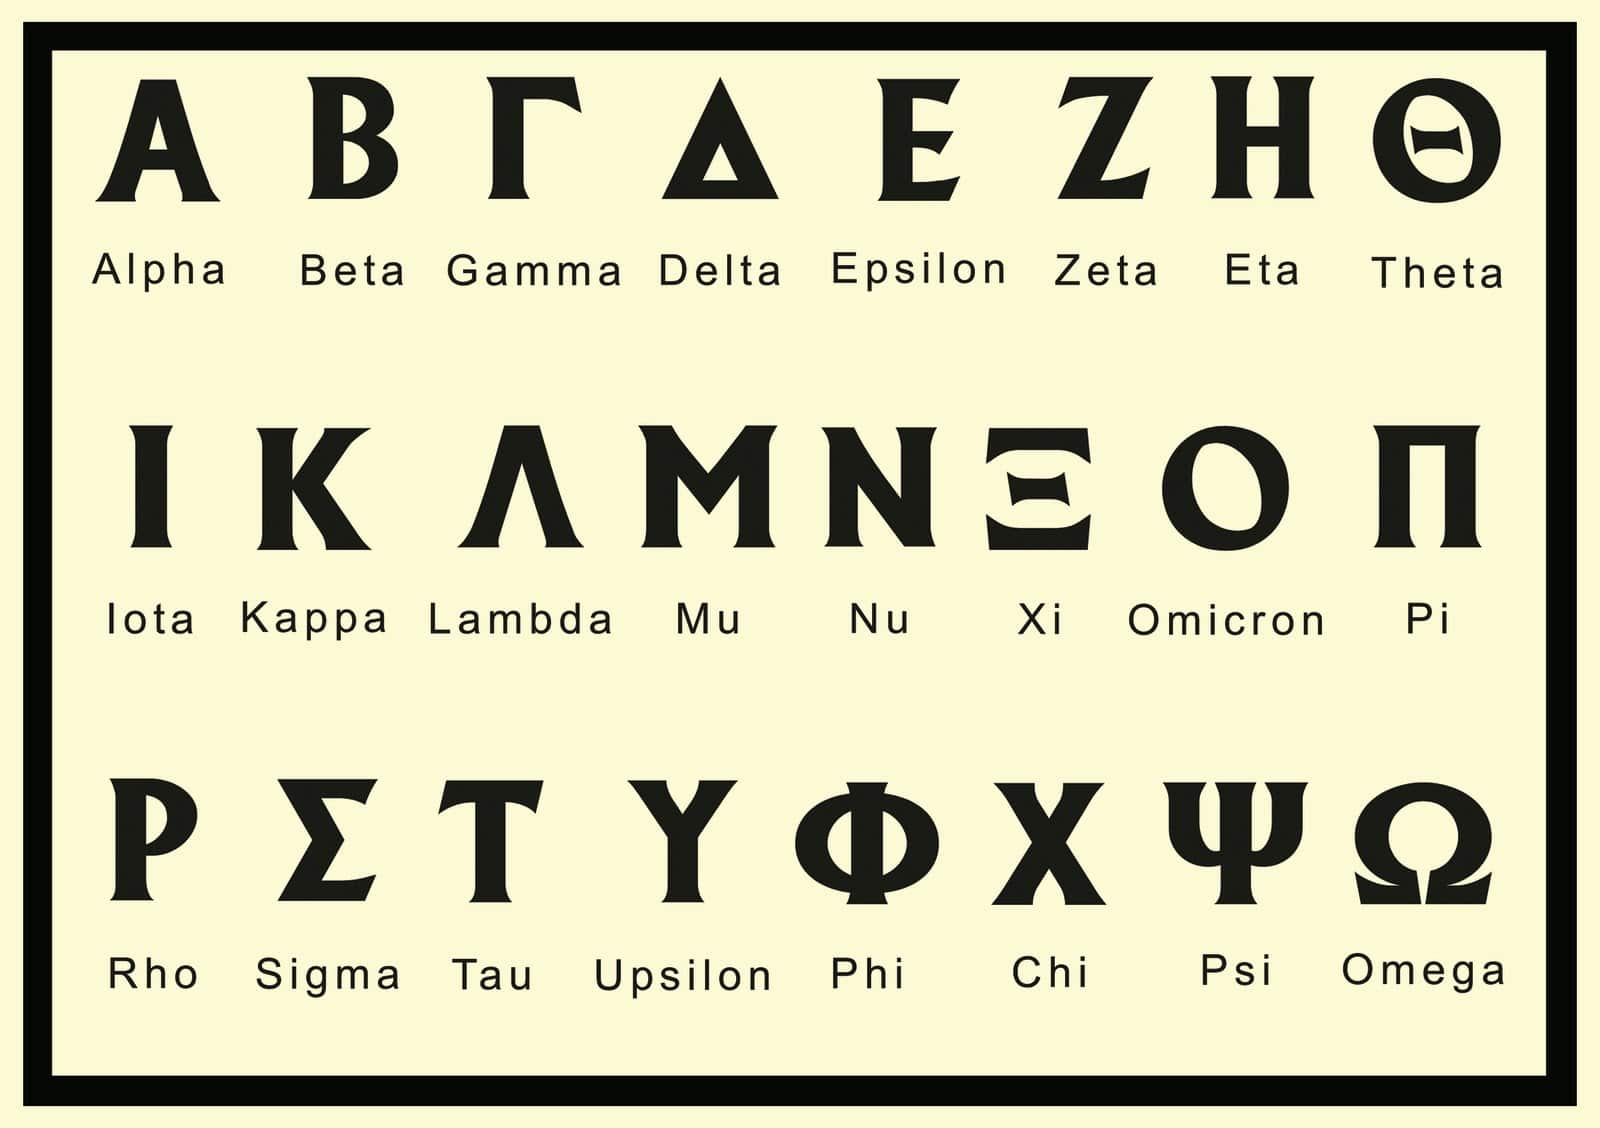 Greek symbols in word images symbol and sign ideas greek letters alphabet fieldstation greek letters alphabet buycottarizona buycottarizona